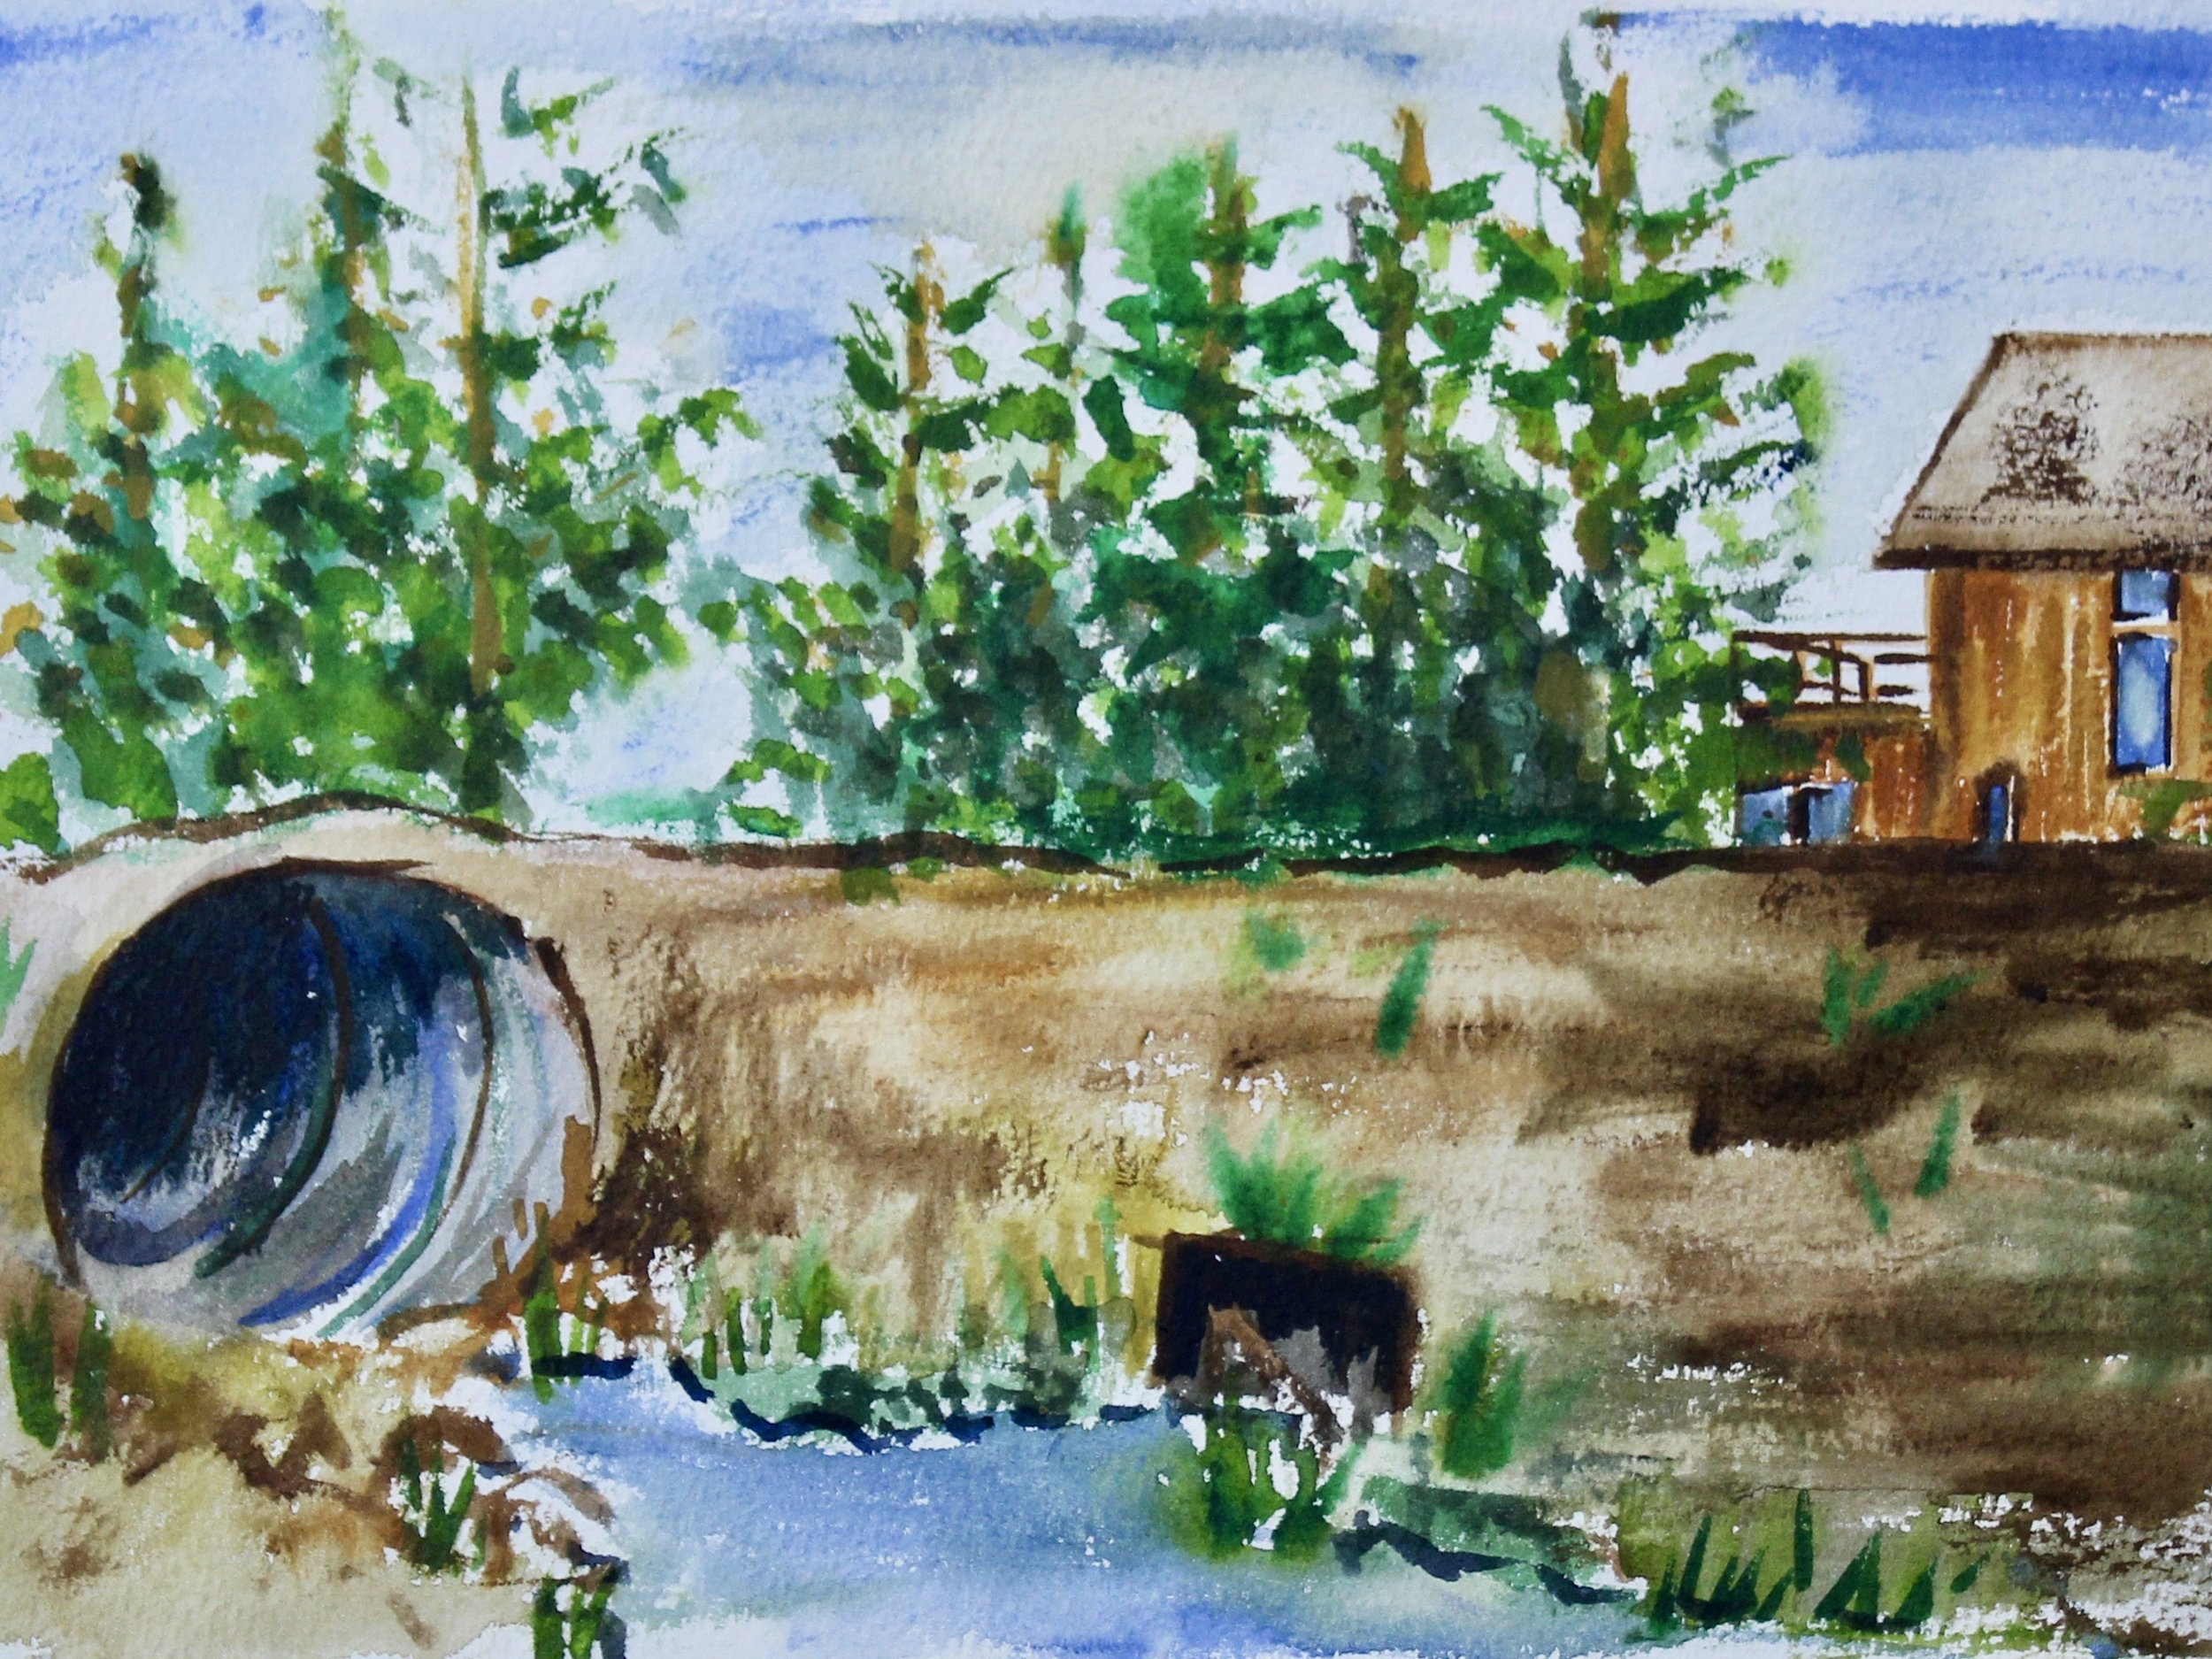 Mansfield 7 -  1999 watercolour on paper 20cm x 26cm